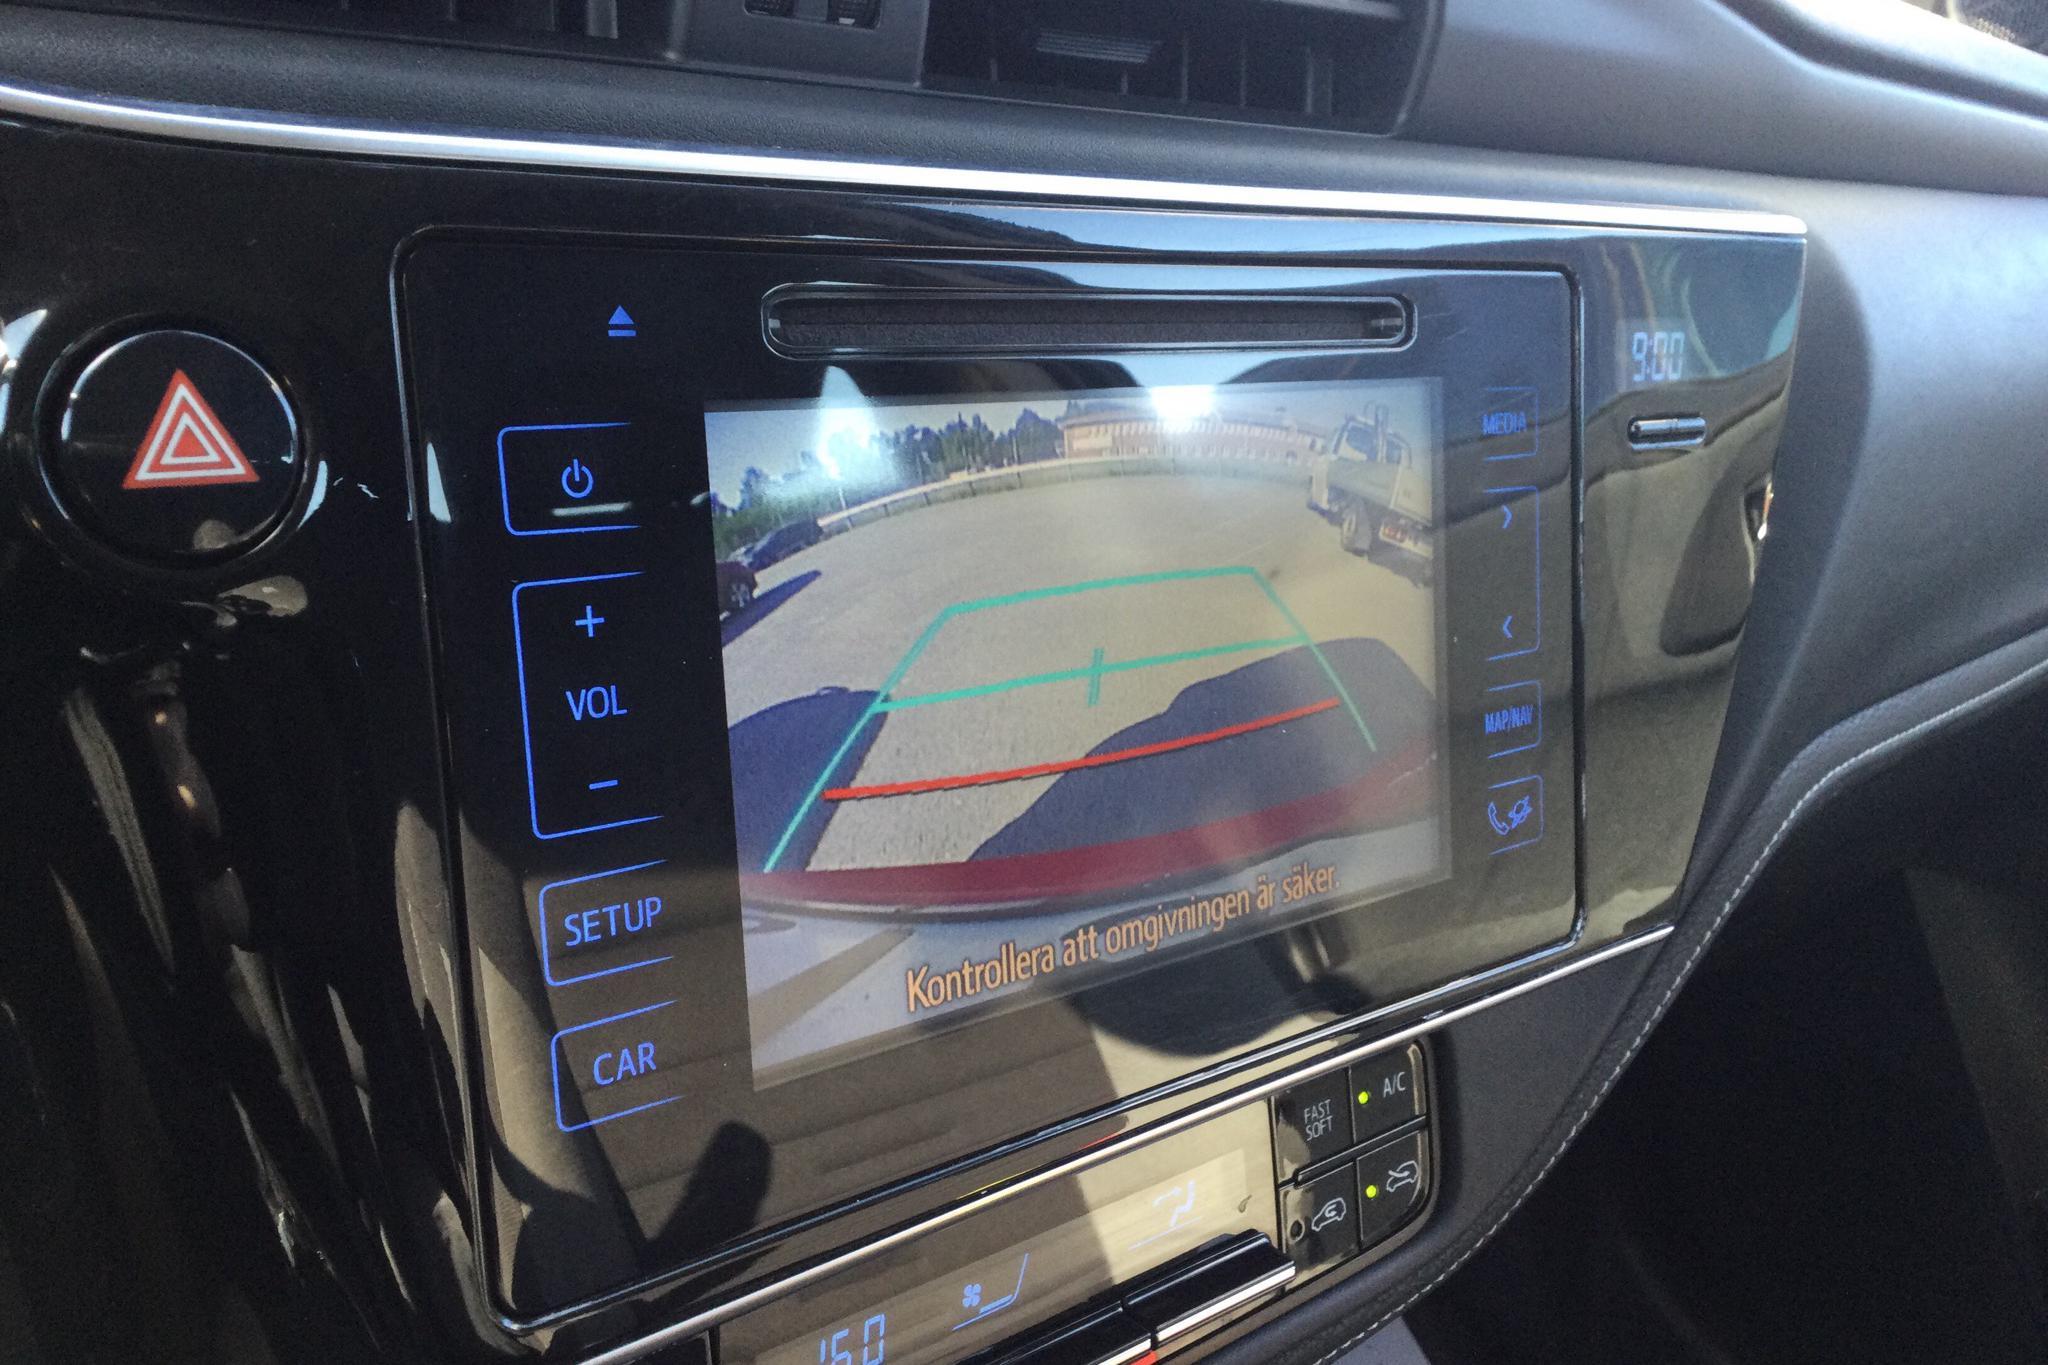 Toyota Auris 1.8 HSD Touring Sports (99hk) - 183 300 km - Automatic - black - 2017